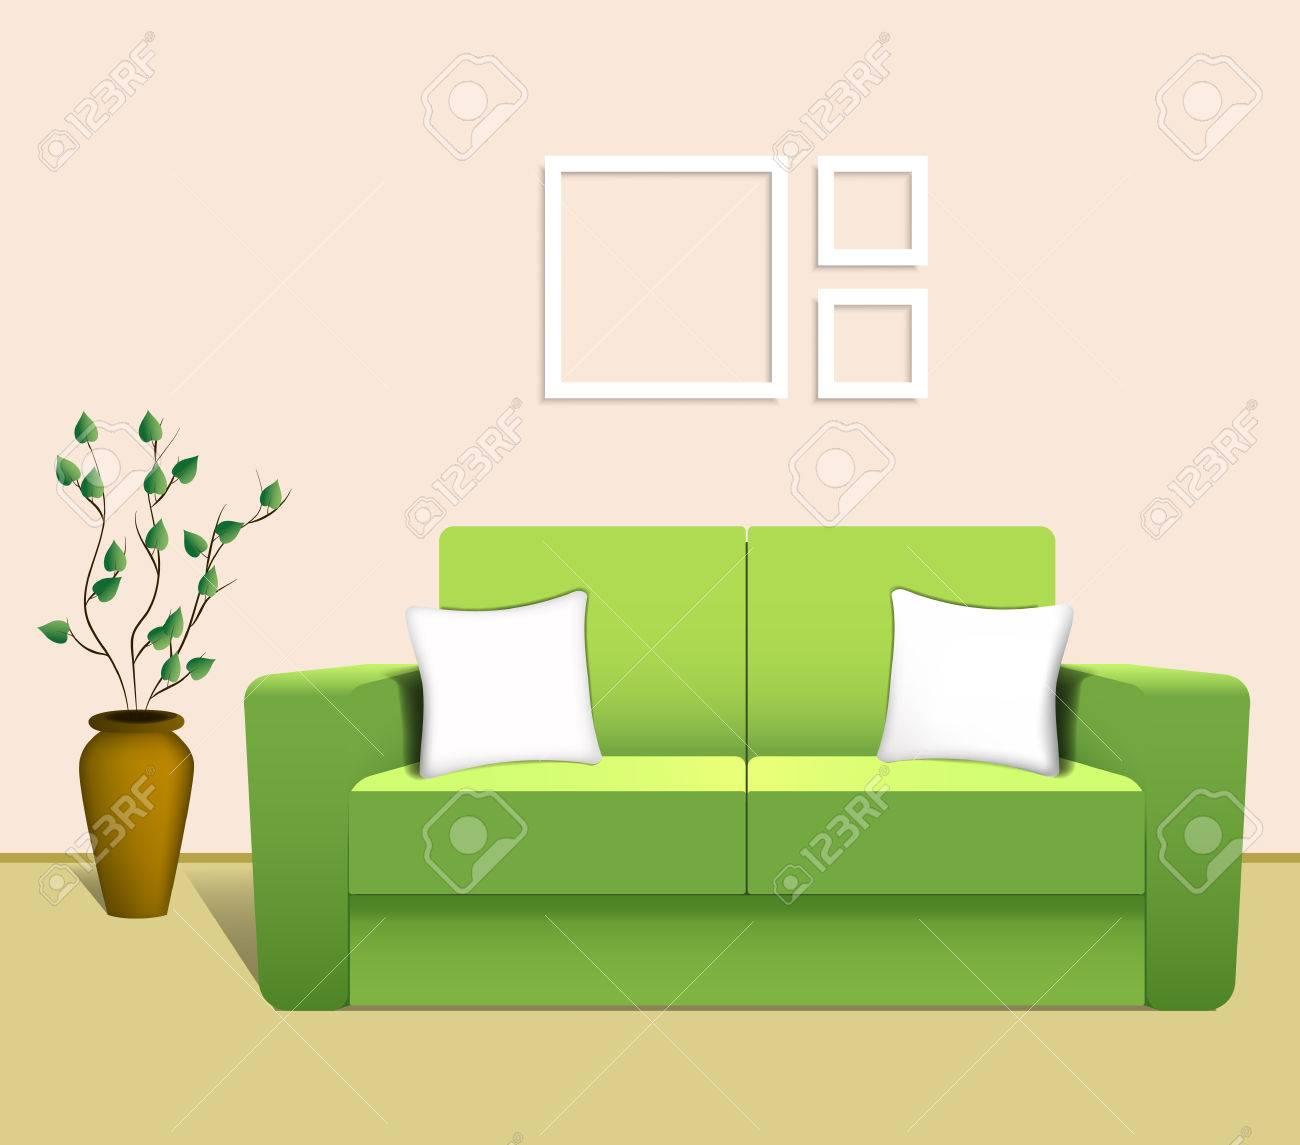 Green Sofa In The Living Room. Vector Illustration Stock Vector   44284058